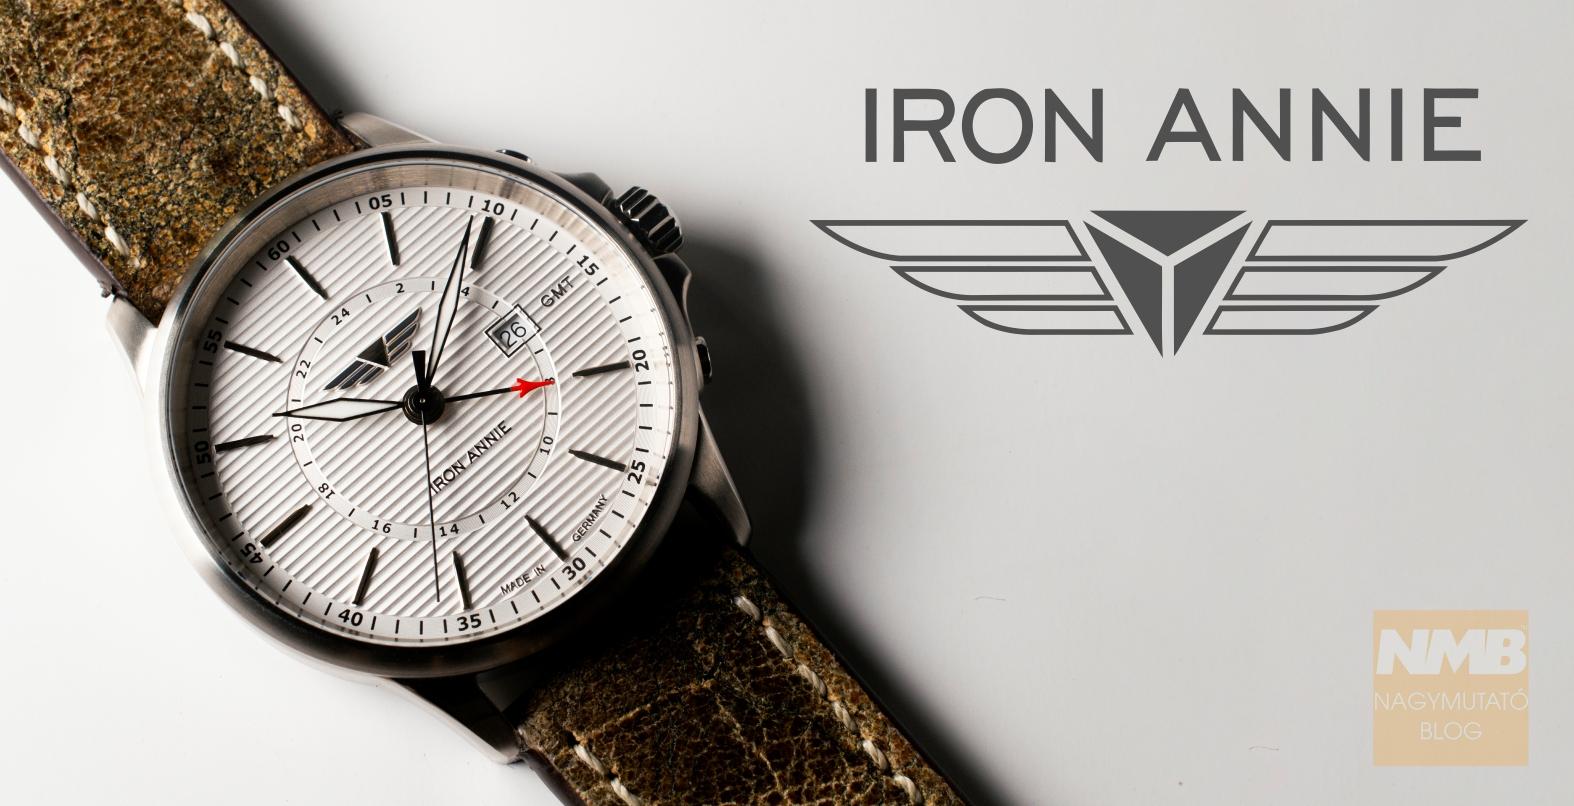 iron-annie-wellblech-5842-1-nagymutato-blog-hero.jpg